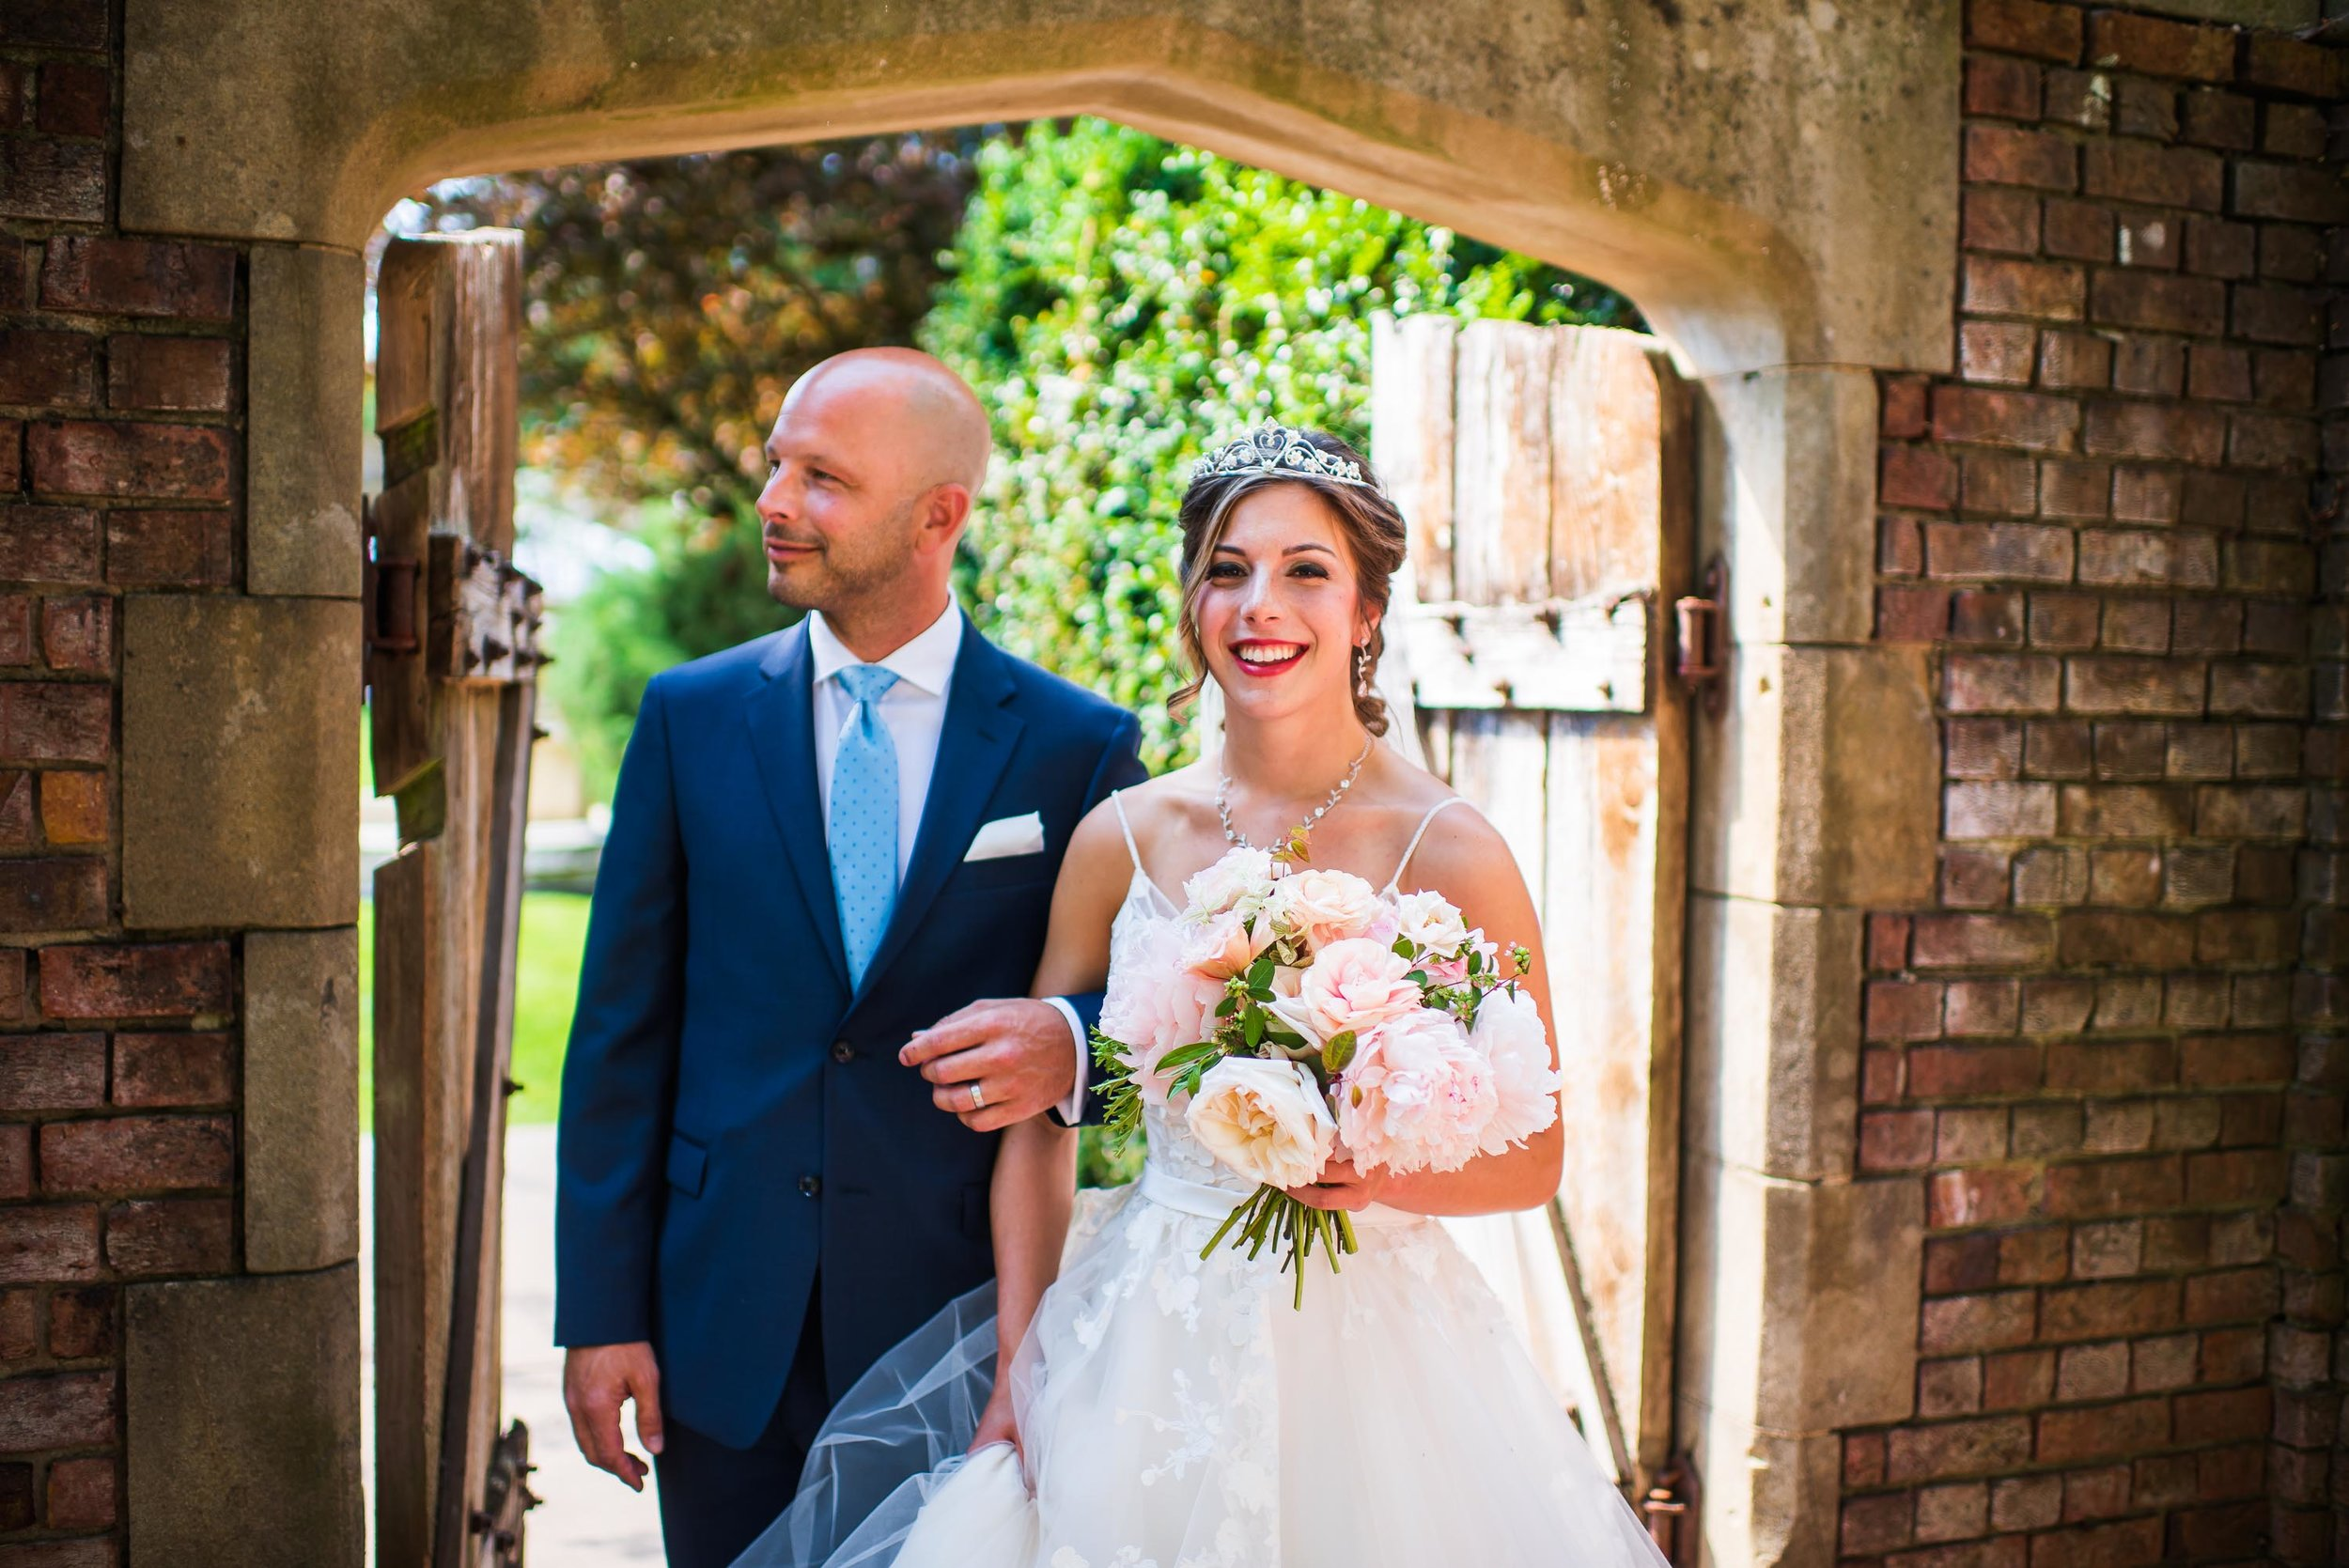 thornewood castle wedding 45.jpg